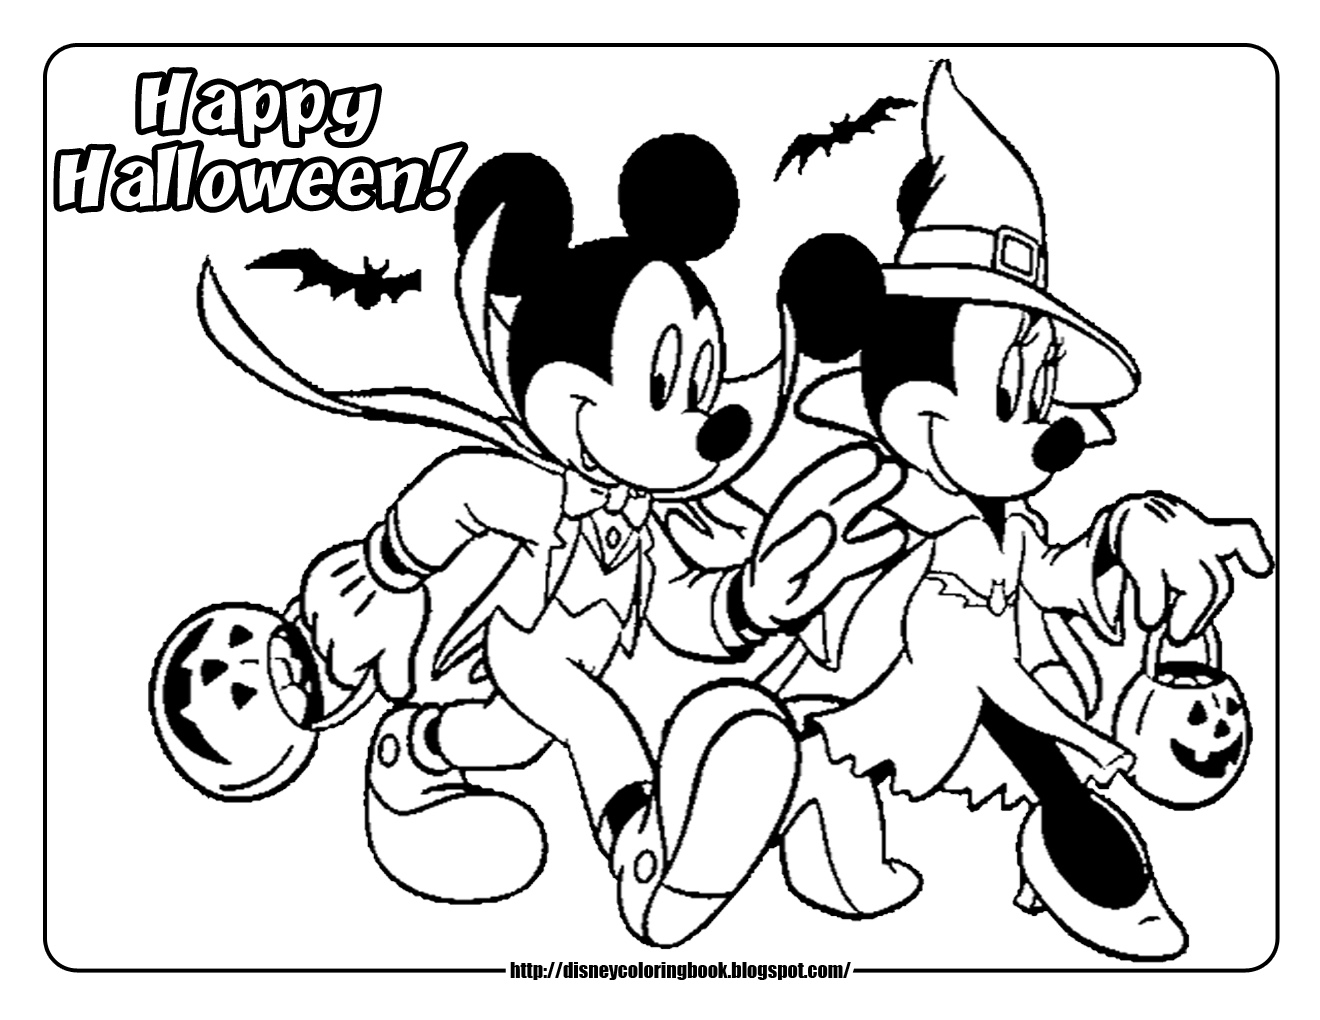 Mickey and Friends Halloween 2: Free Disney Halloween